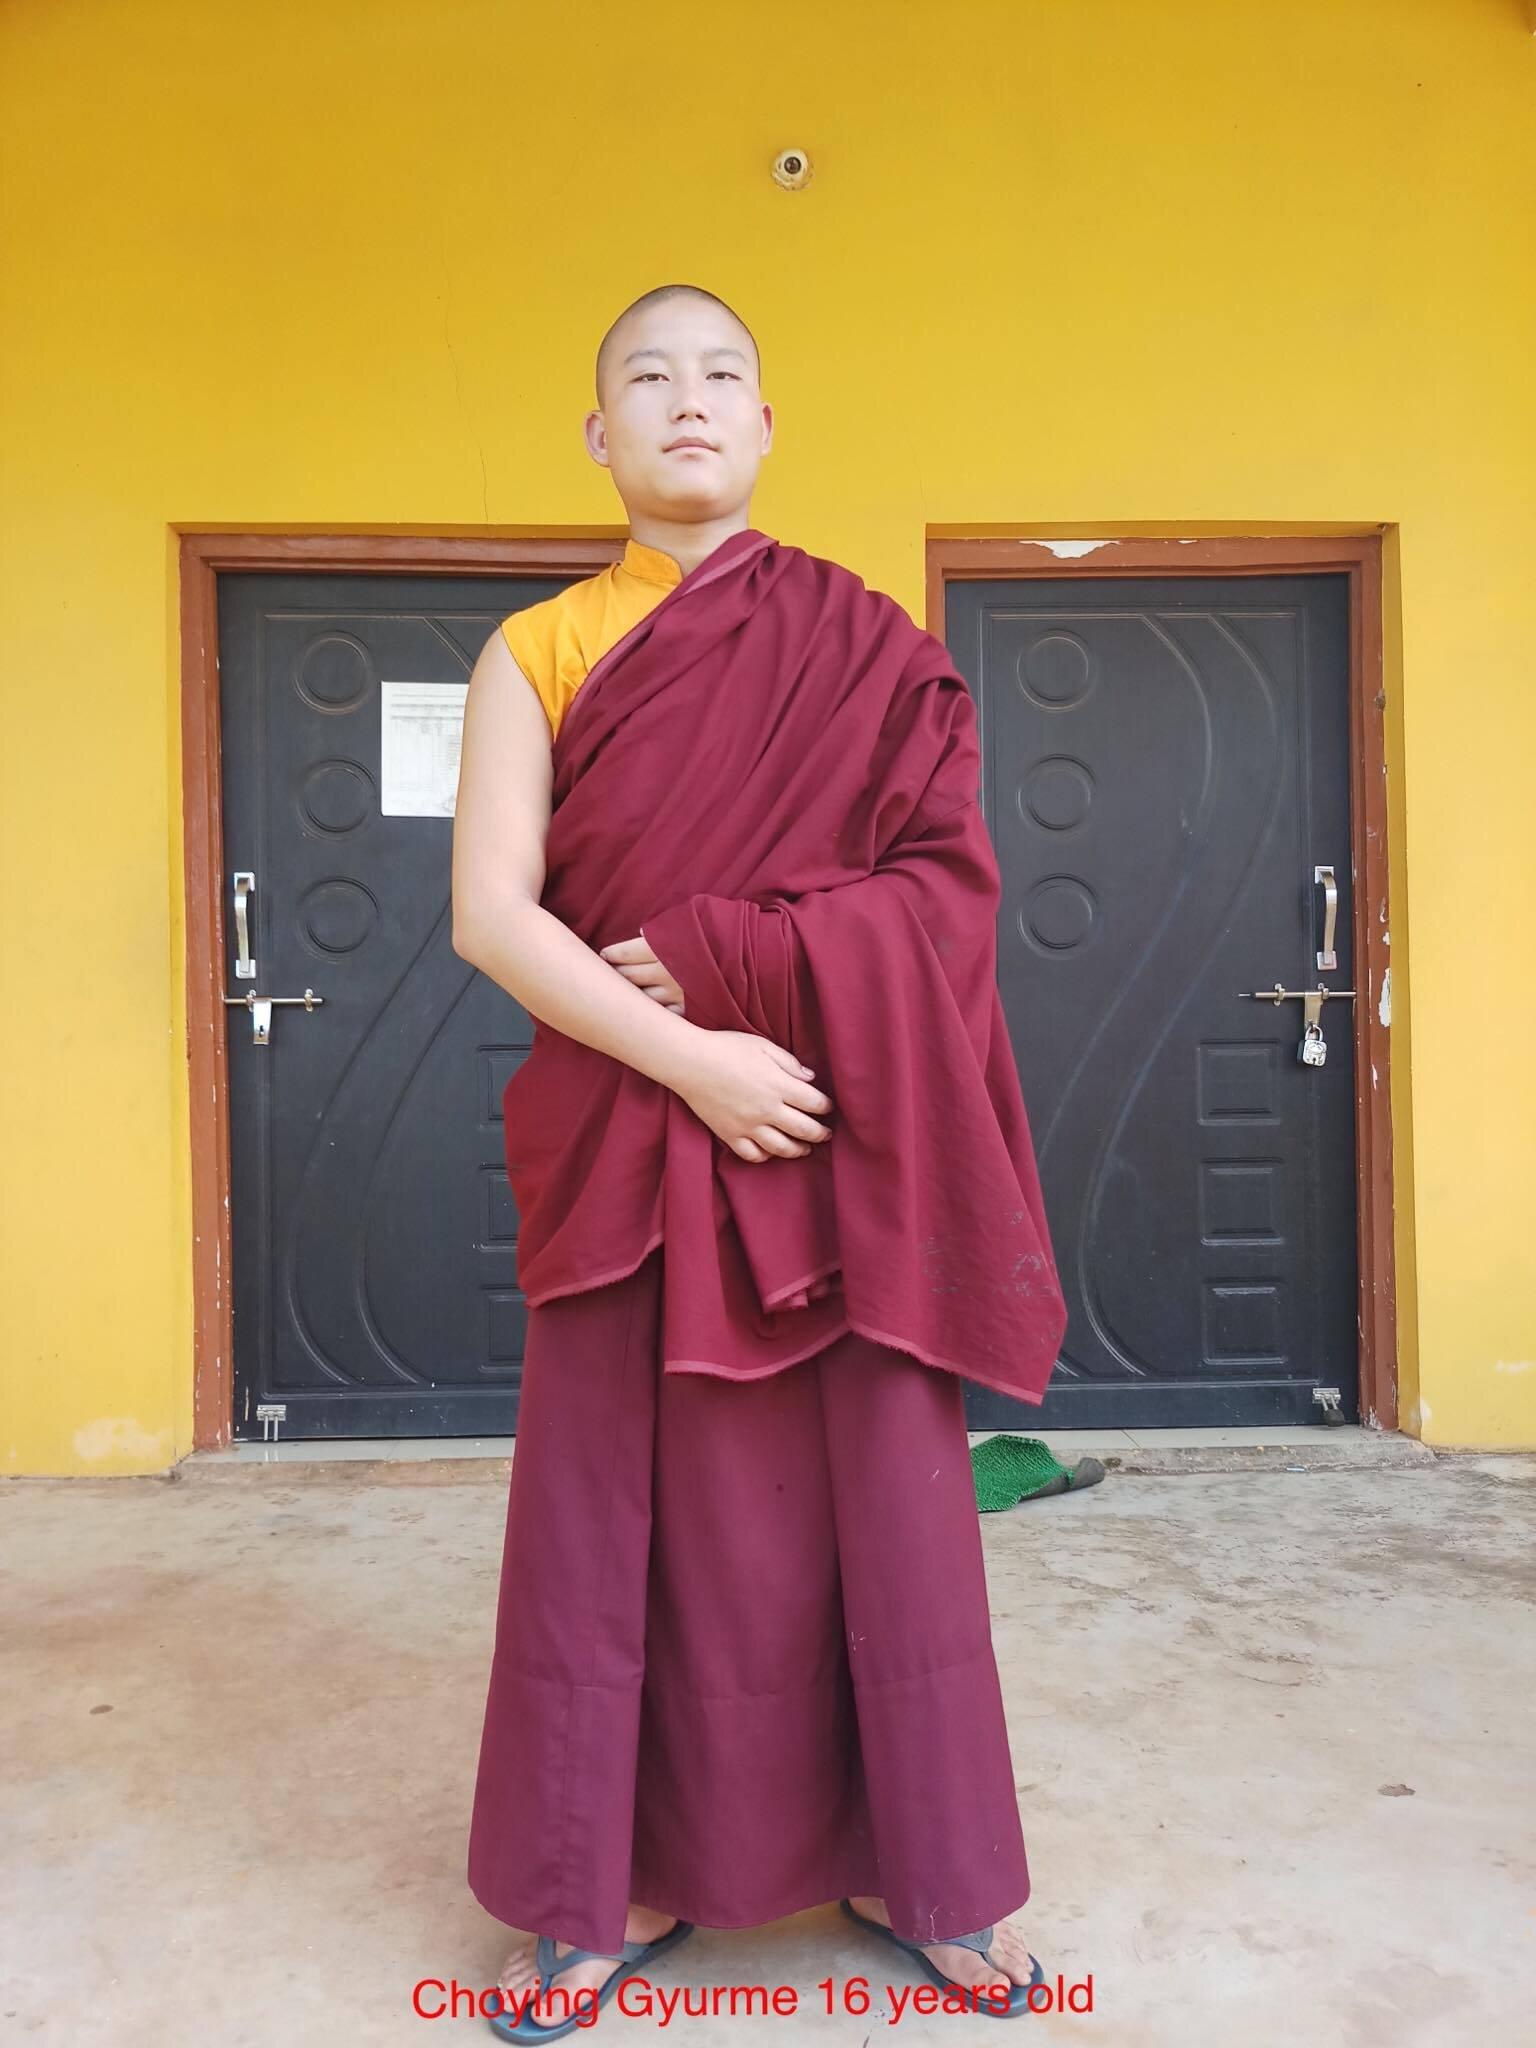 Monk_Choying_Gyurme_16yrs_old.jpg